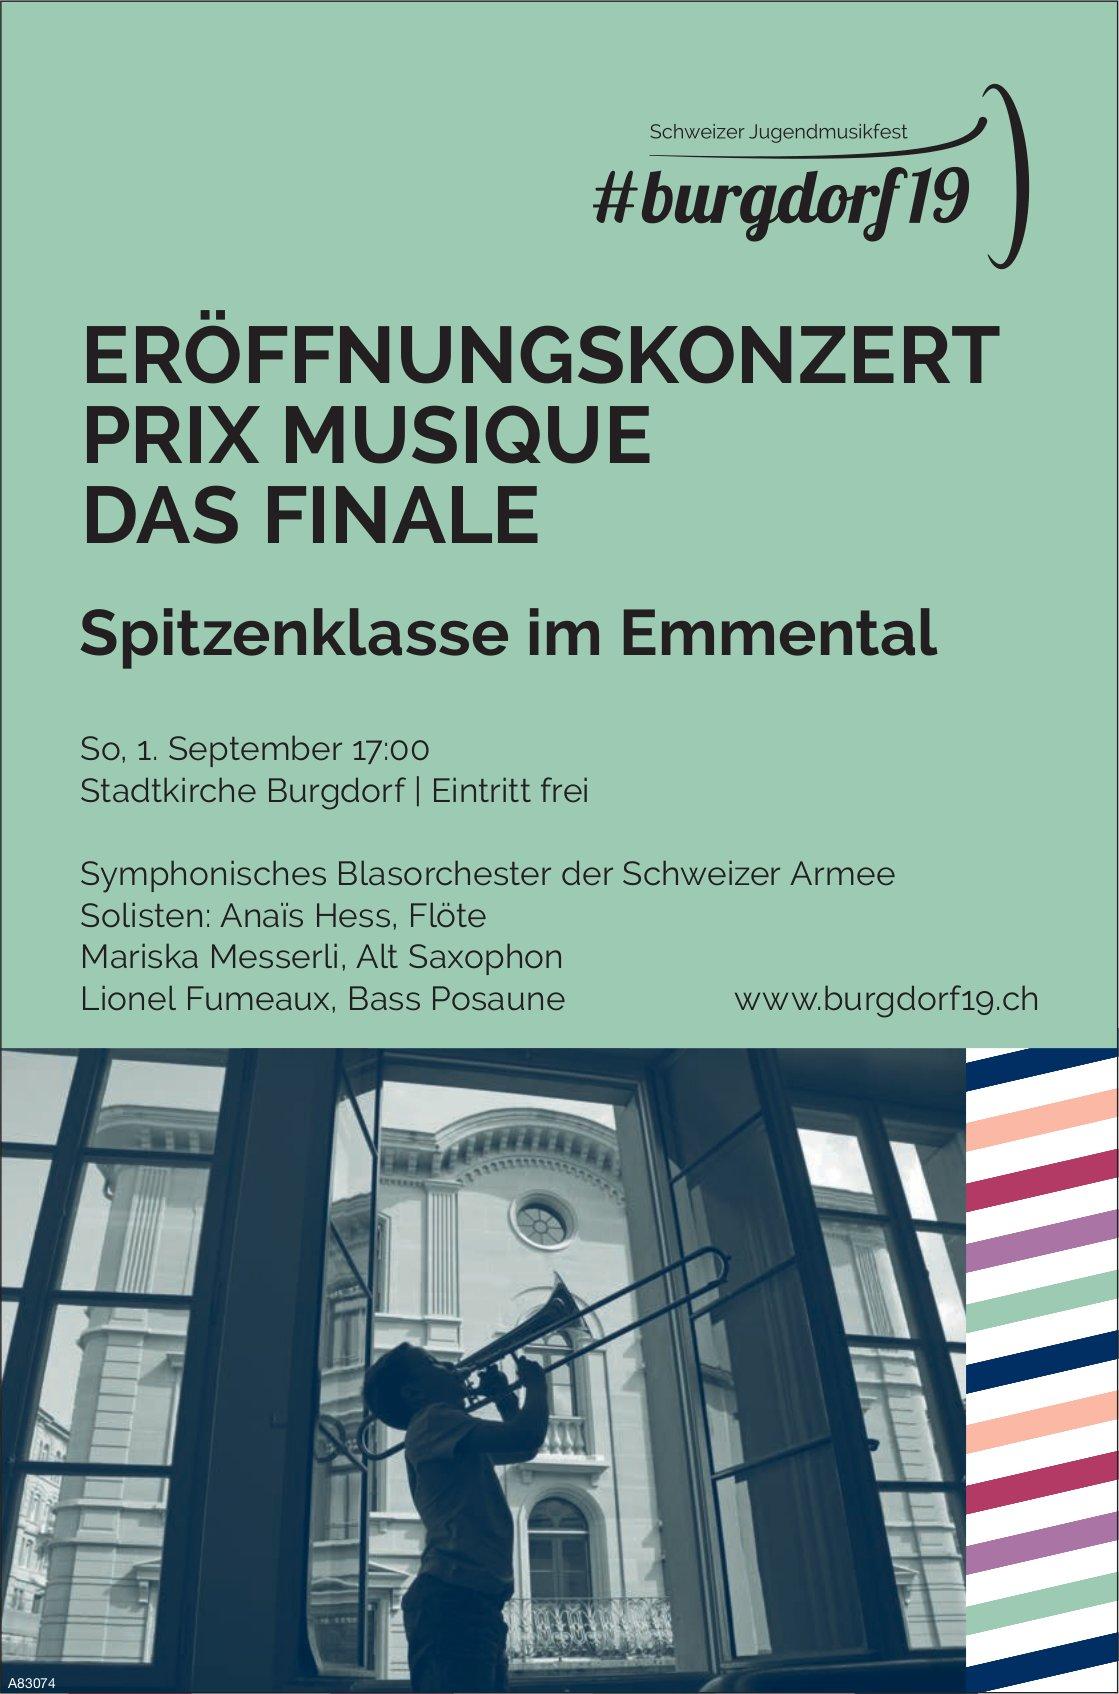 Burgdorf19 - ERÖFFNUNGSKONZERT PRIX MUSIQUE DAS FINALE AM 1. SEPTEMBER